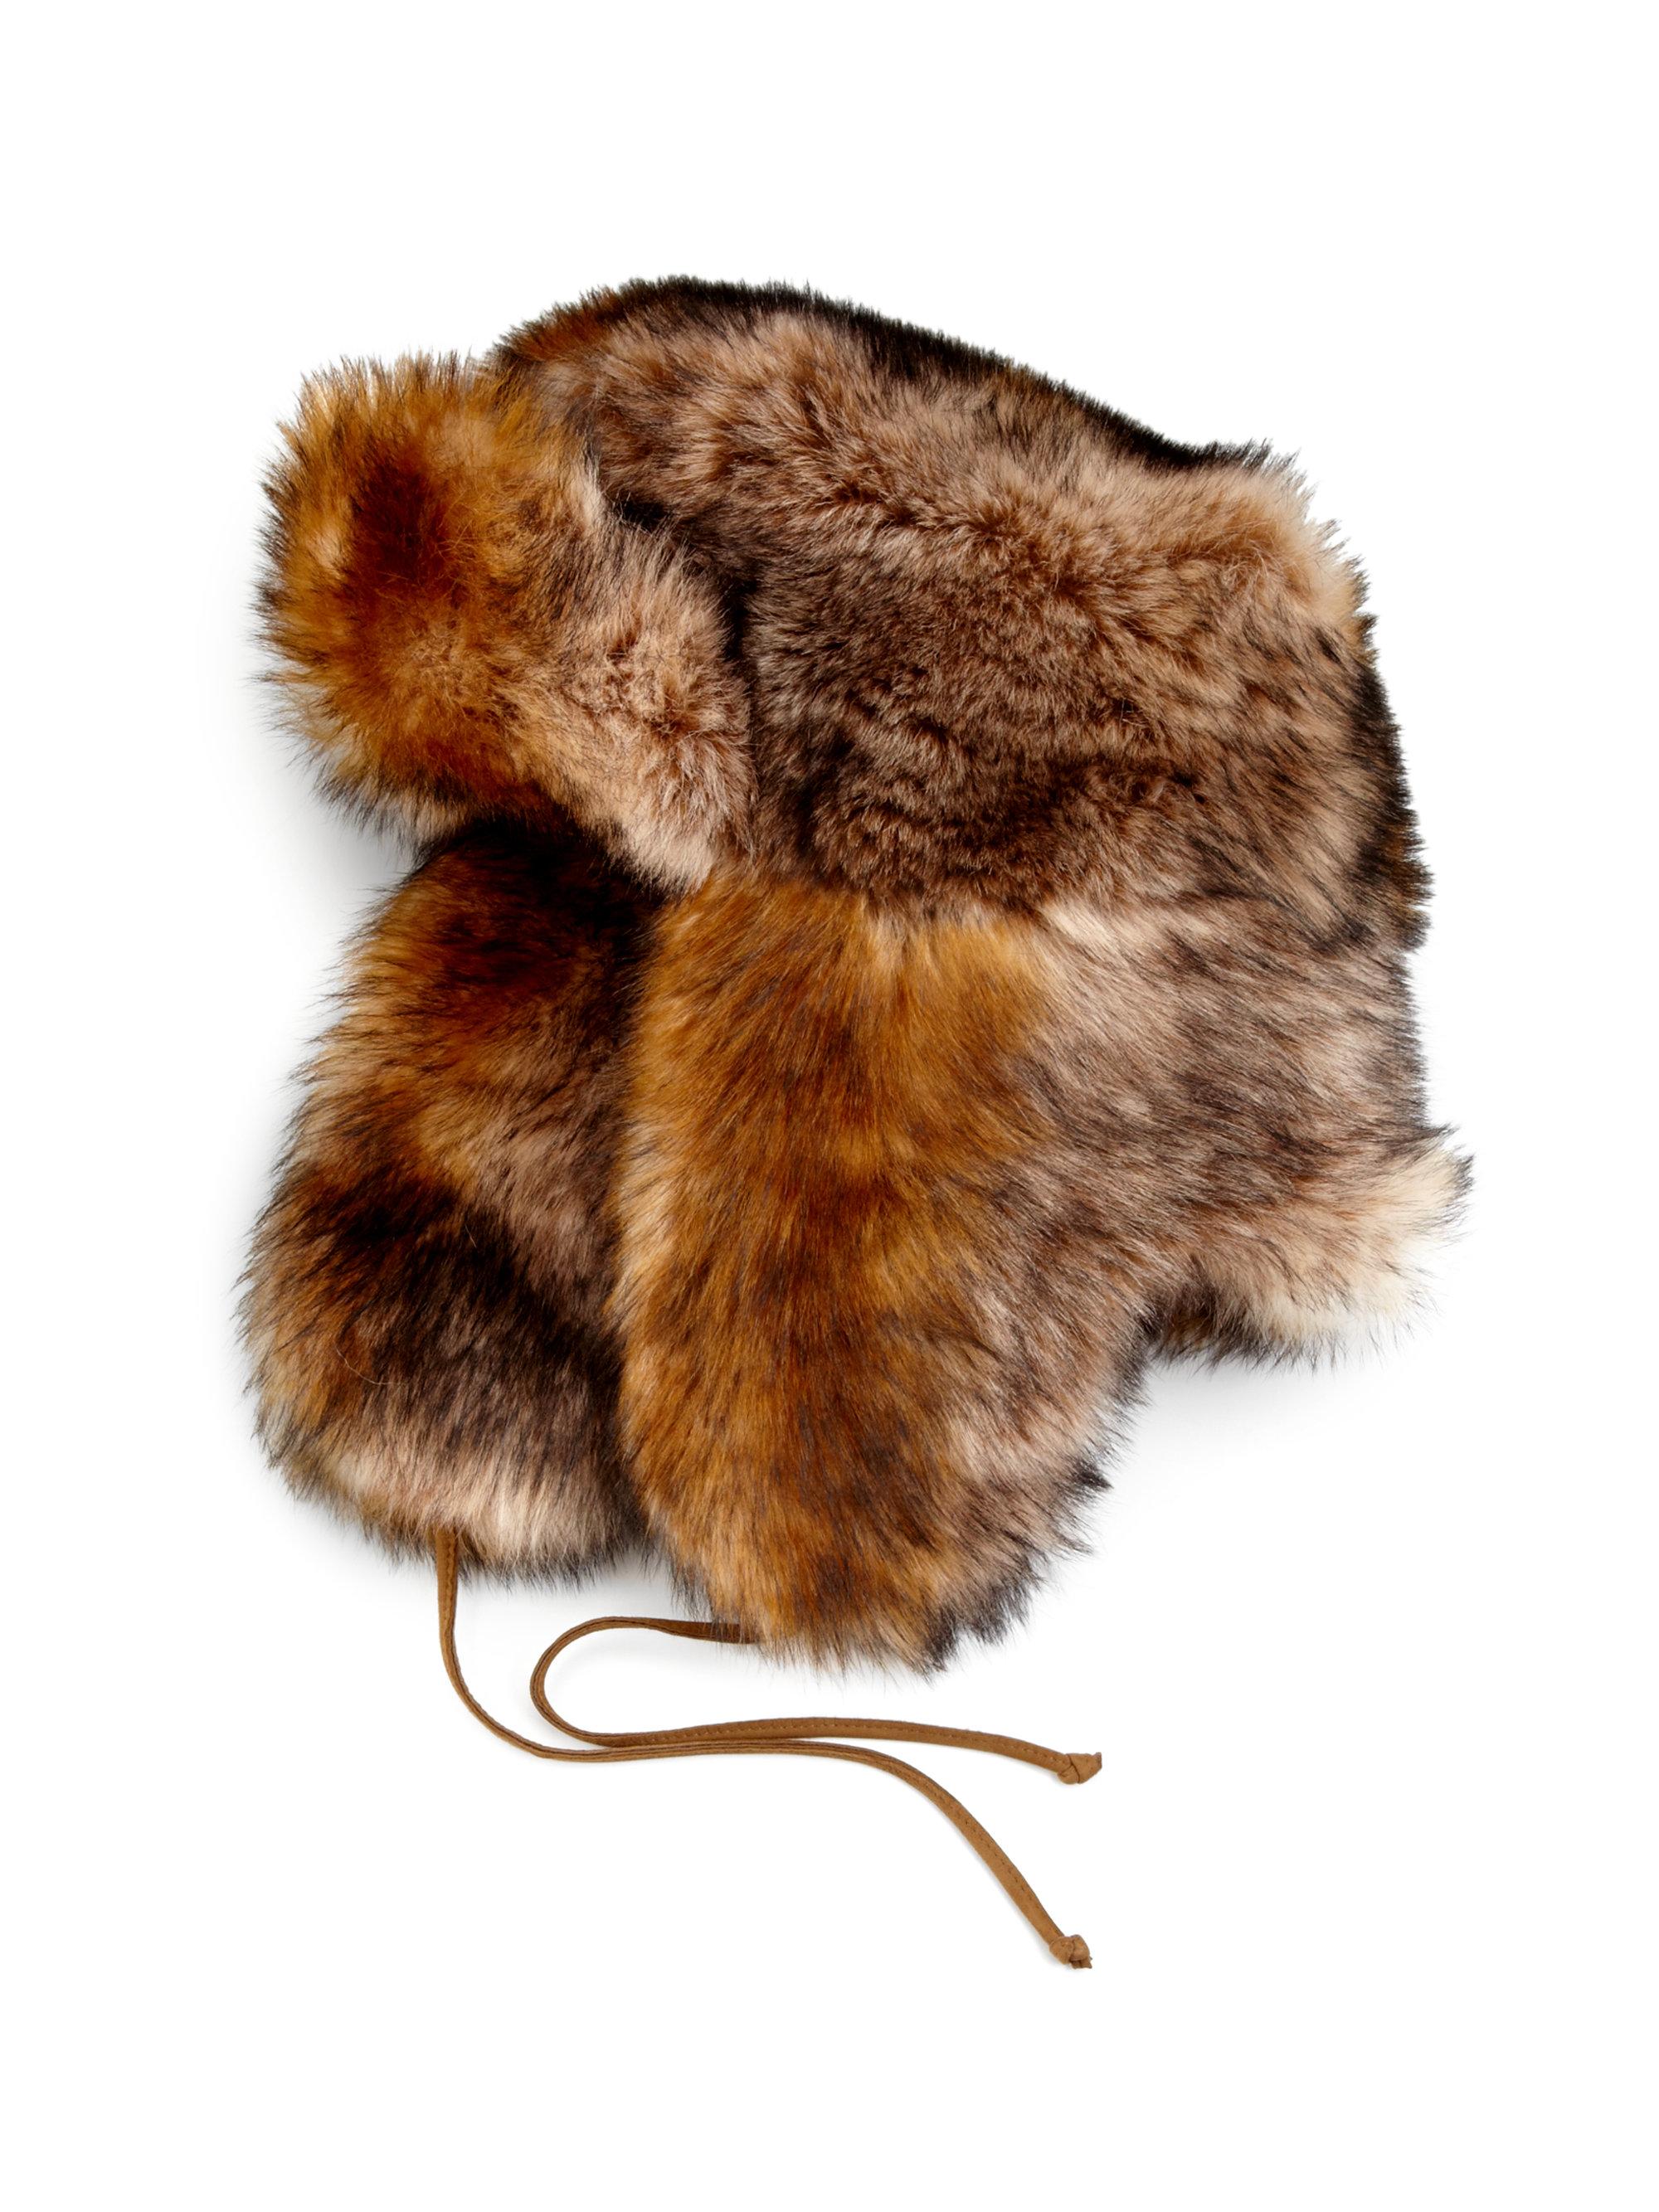 Lyst - Ralph Lauren Shearling Trapper Hat in Brown 5739559d1b0